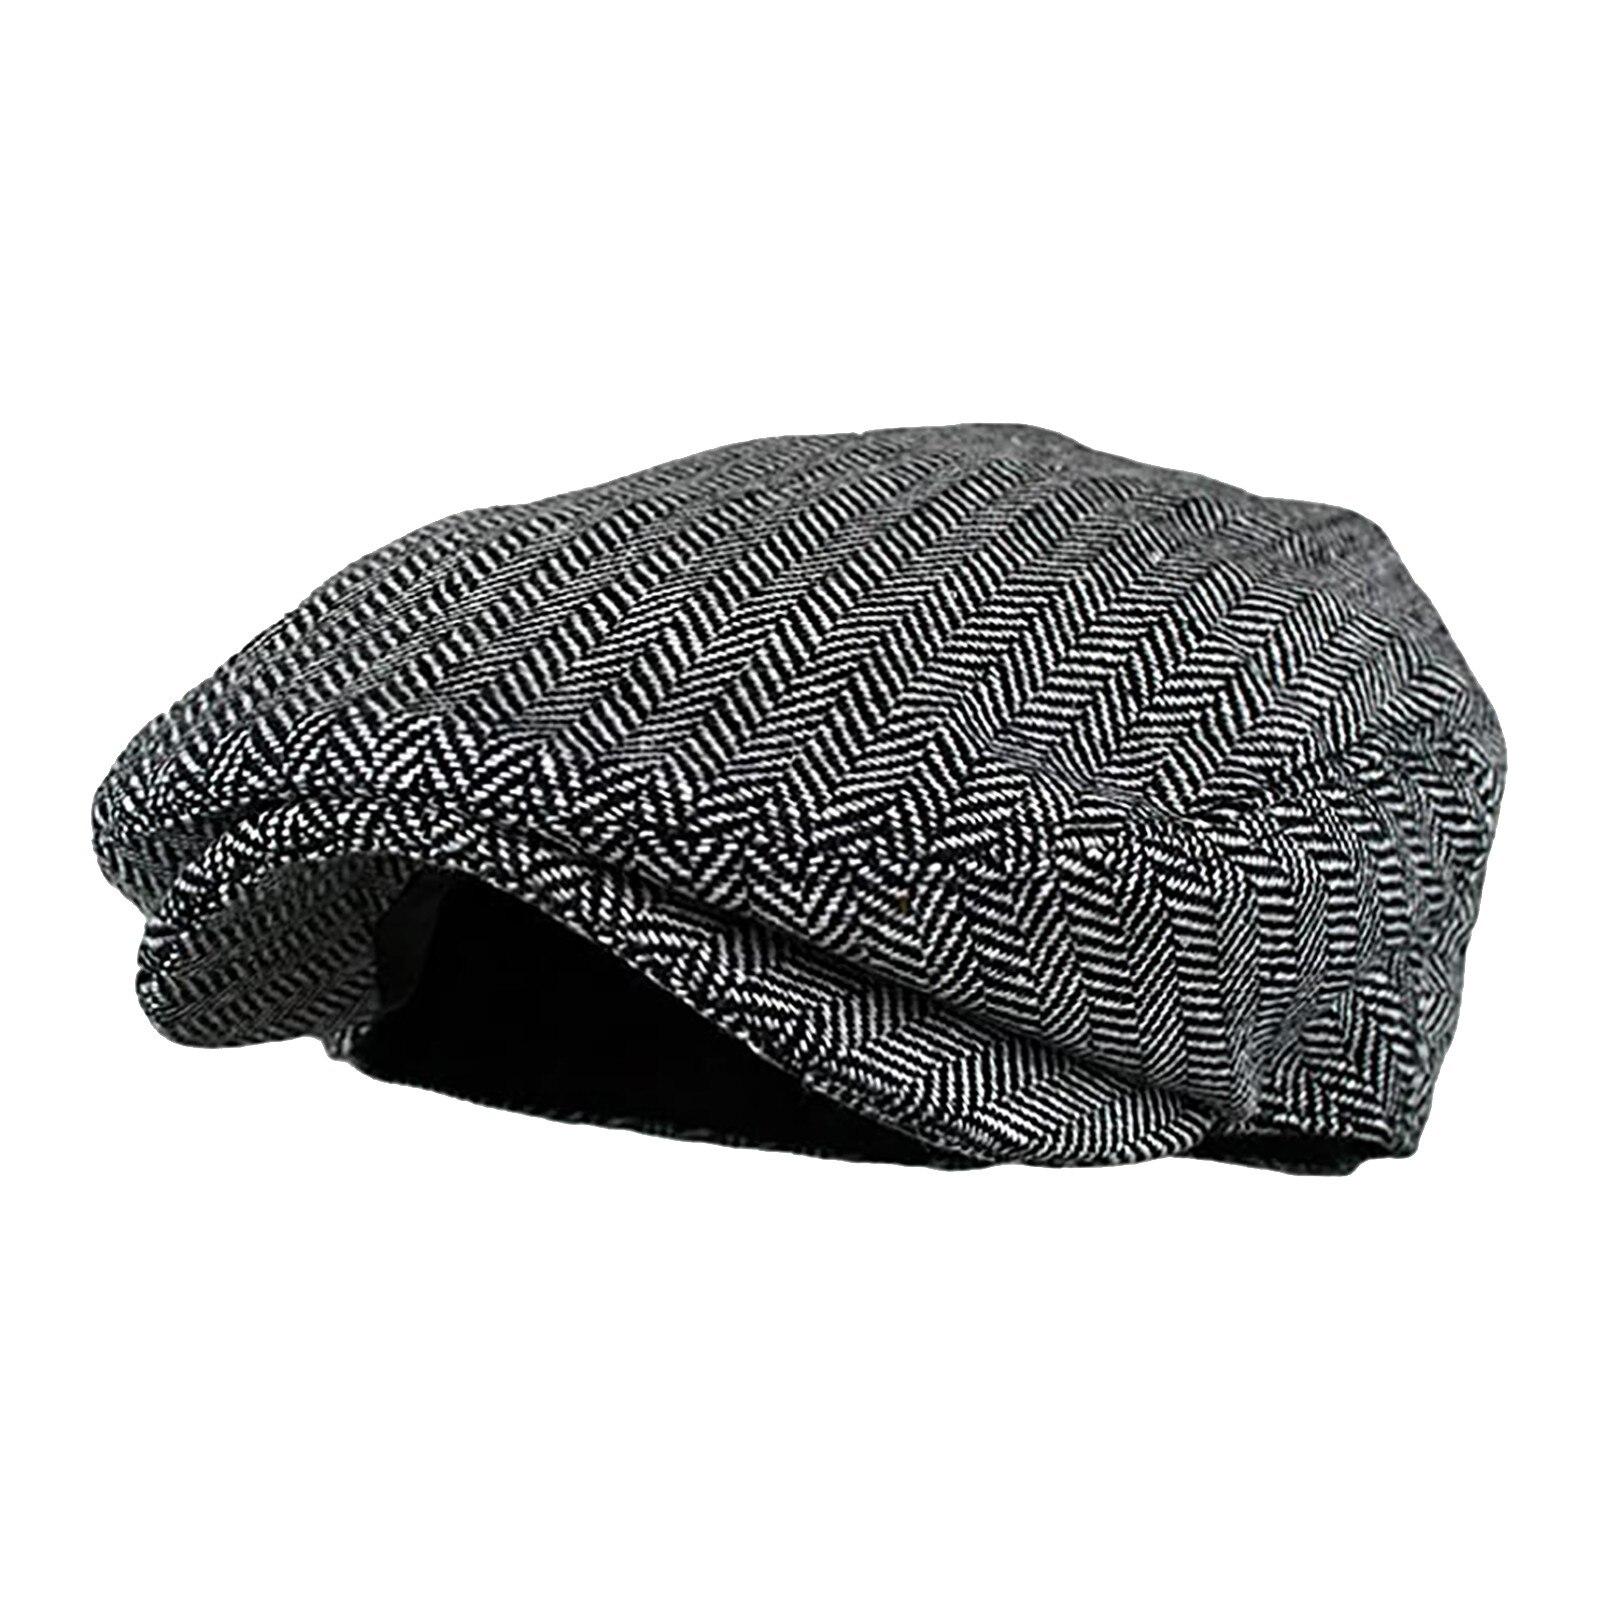 2020 outono inverno masculino boné chapéus boinas estilo ocidental britânico lã avançada plana ivy boné clássico vintage listrado boina